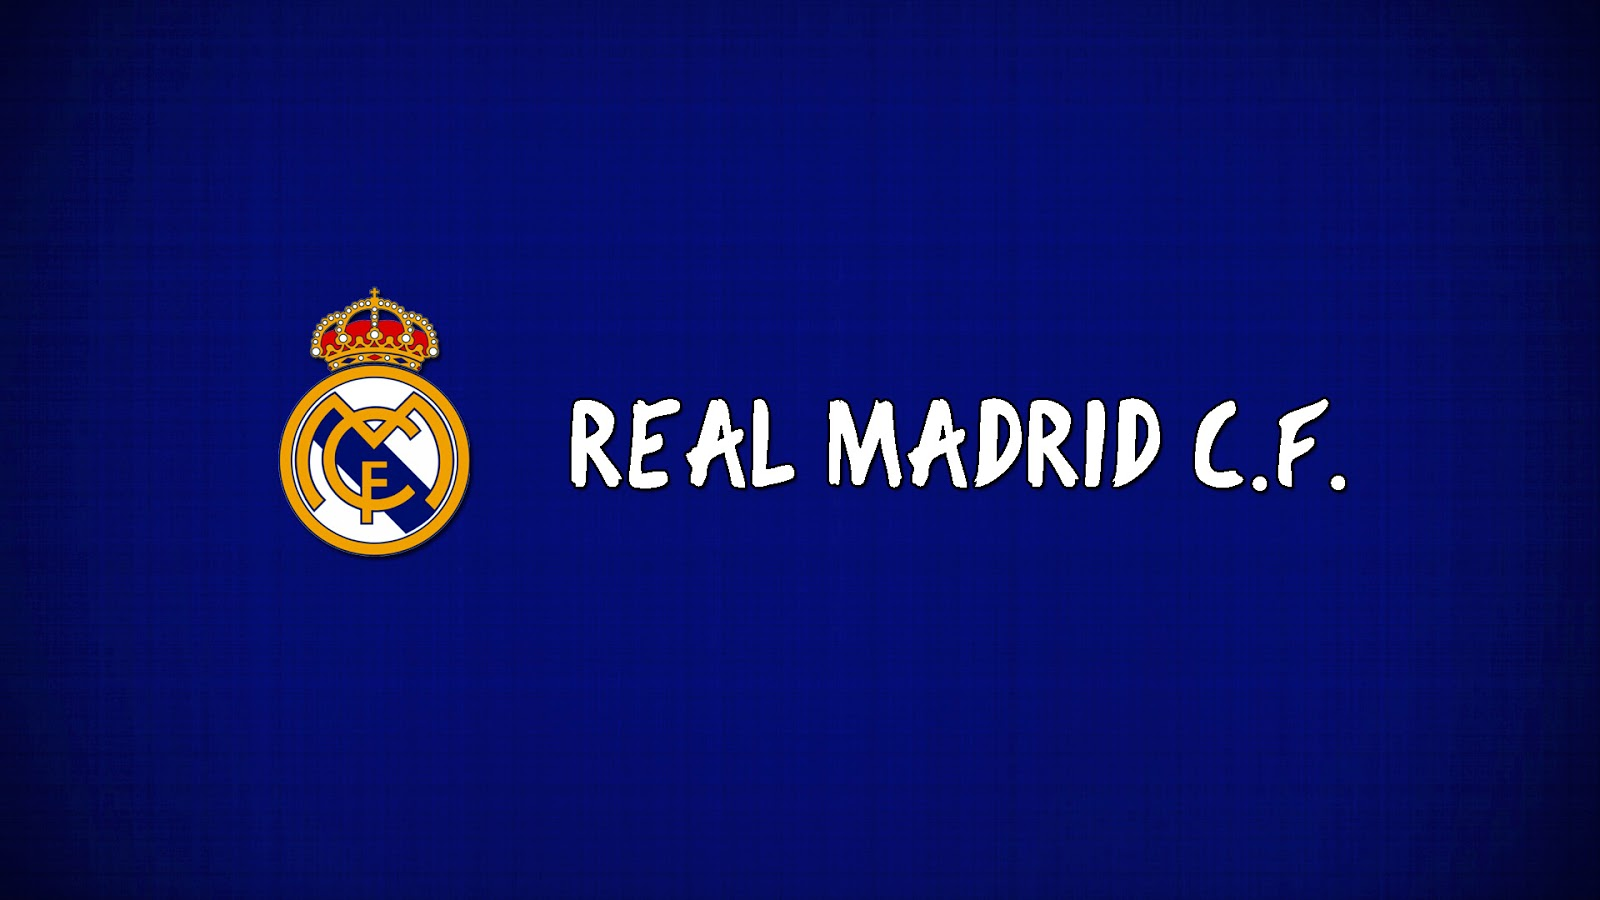 Wallpaper Blackberry Real Madrid 456931 Hd Wallpaper